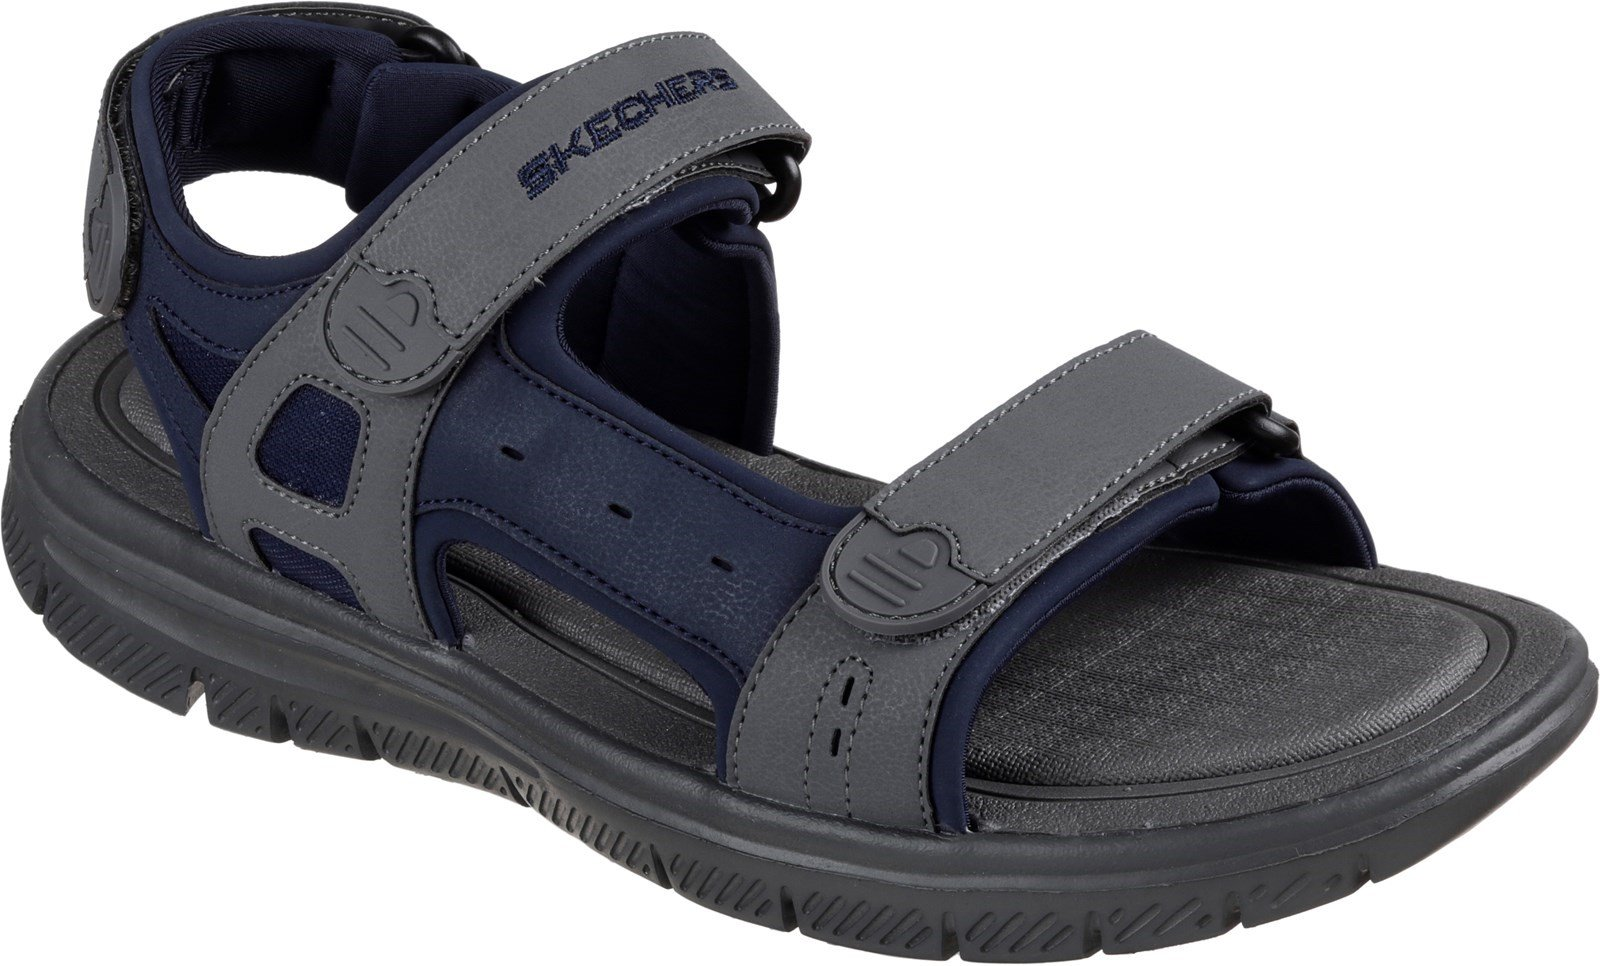 Skechers Men's Flex Advantage S Upwell Summer Sandal Multicolor 32213 - Navy/Charcoal 6